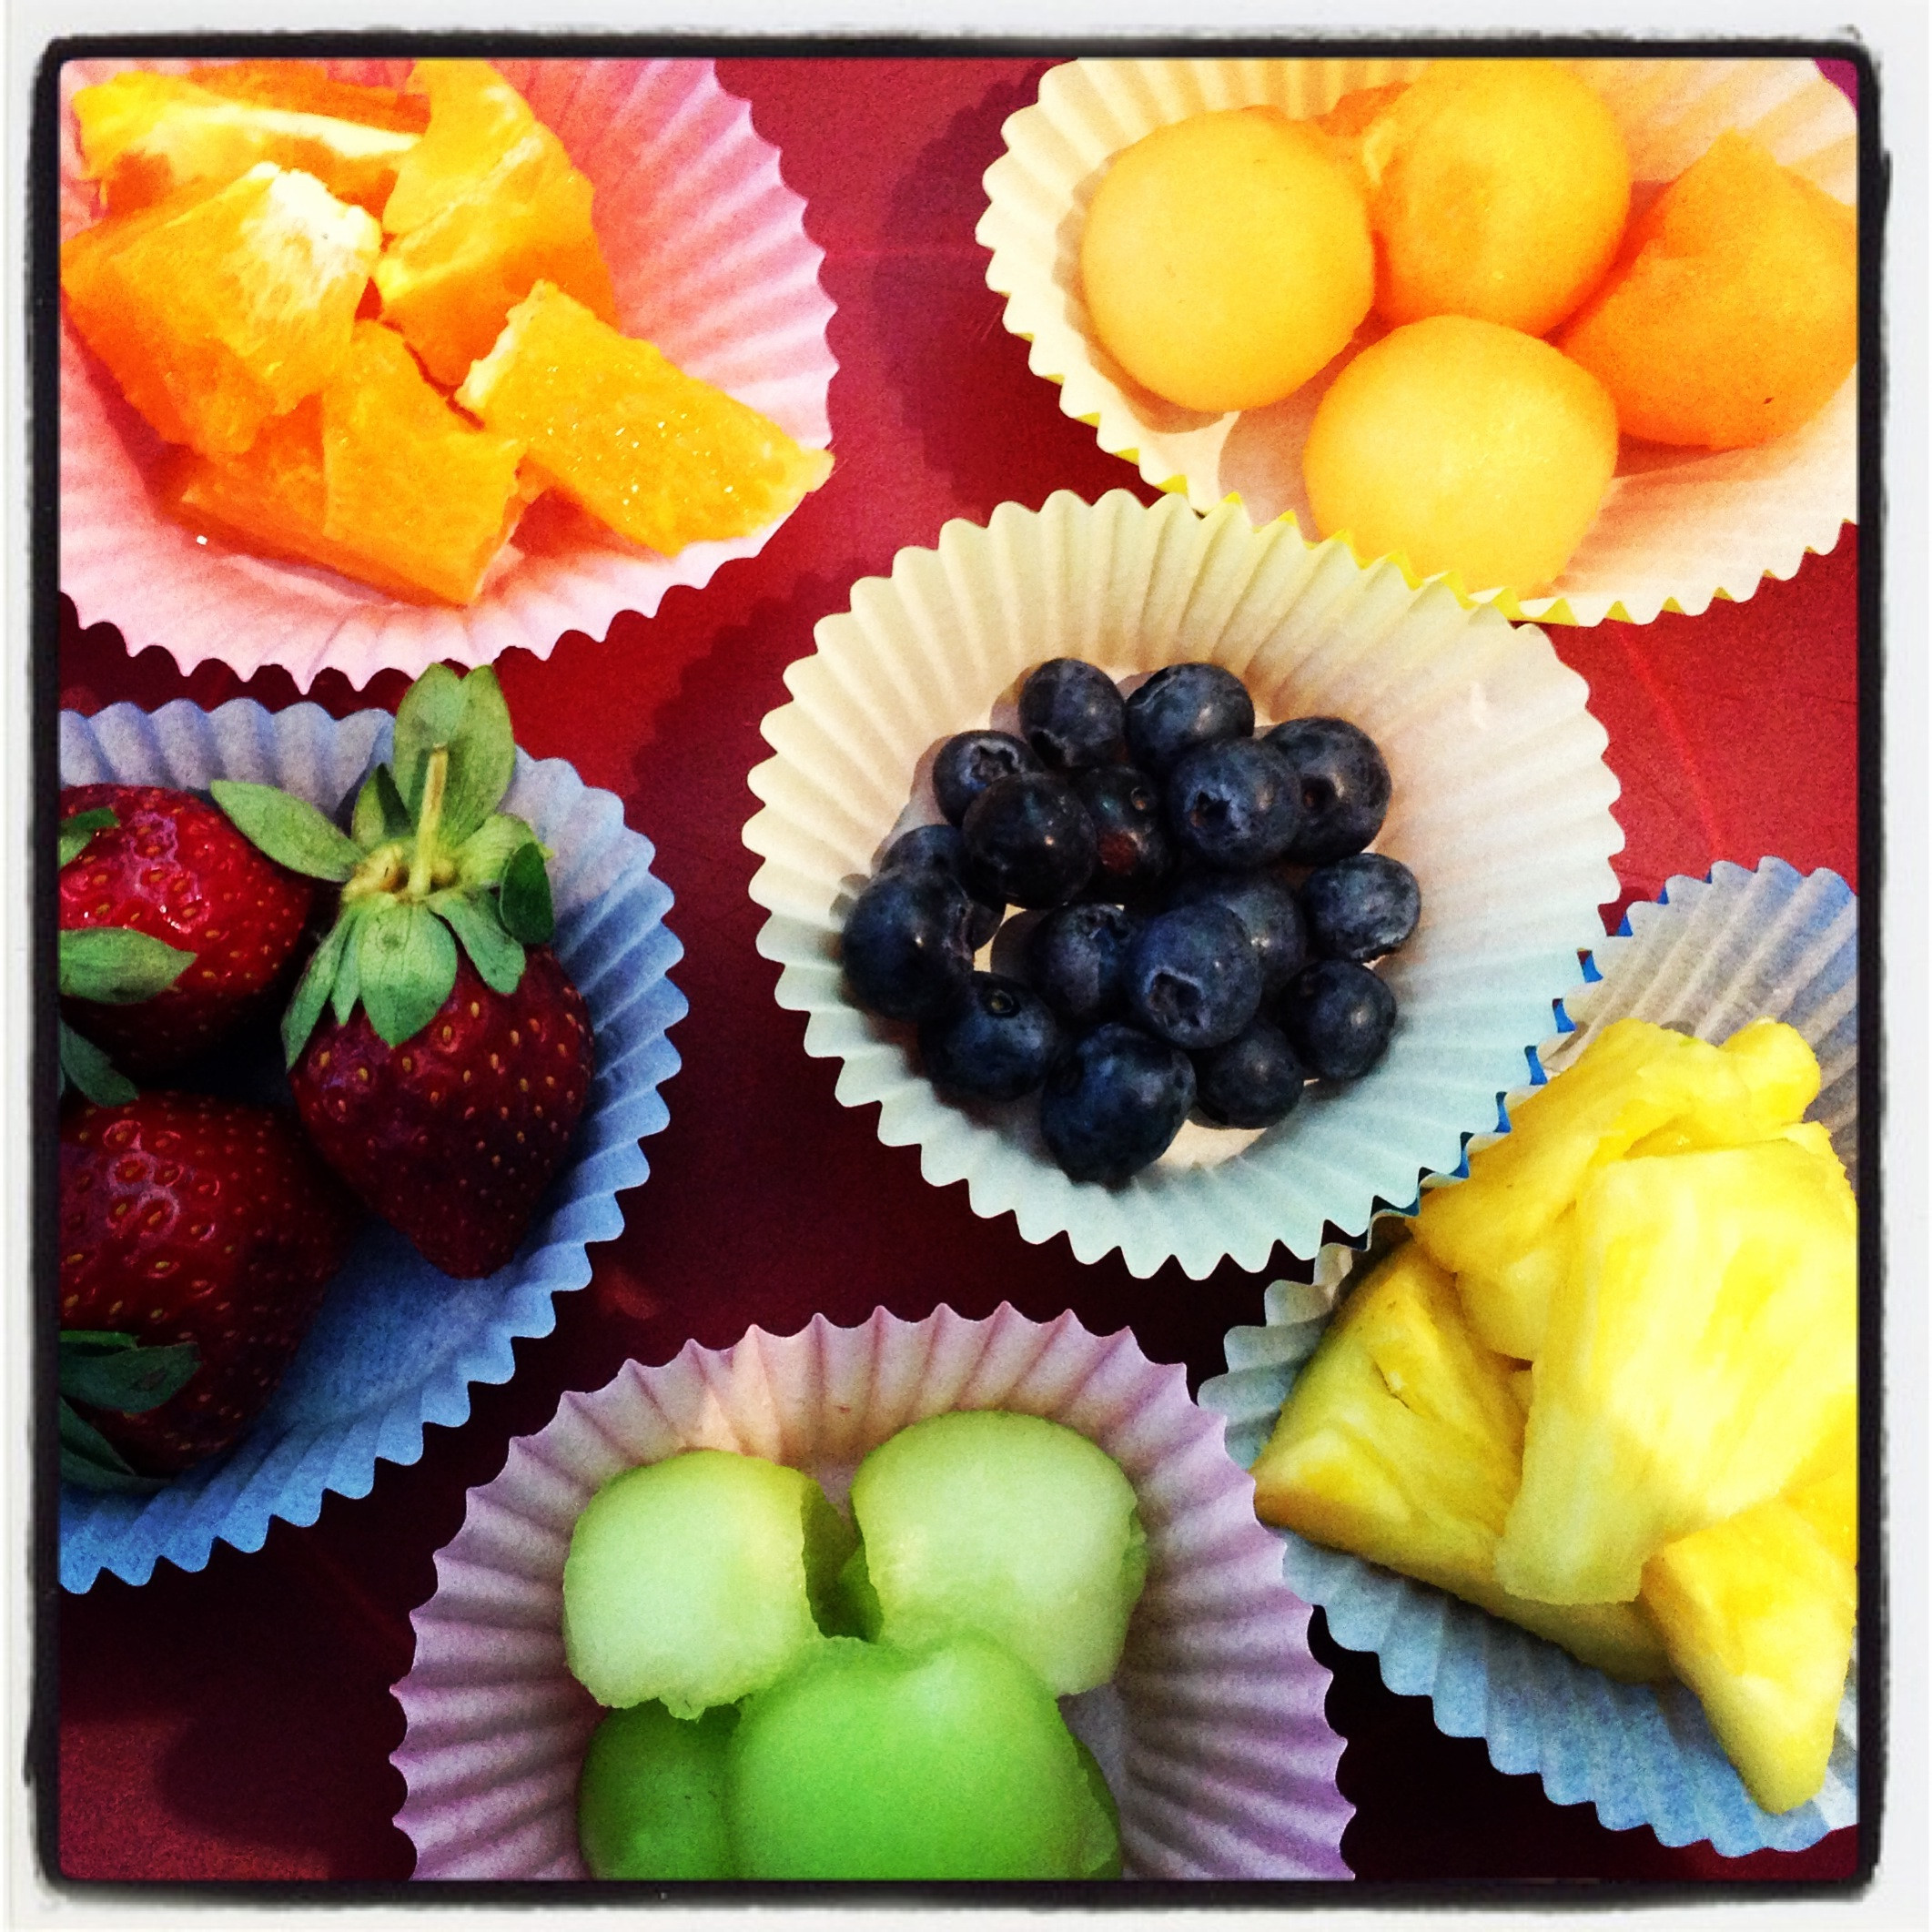 Healthy Party Snacks  Healthy party food ideas Healthy Kids